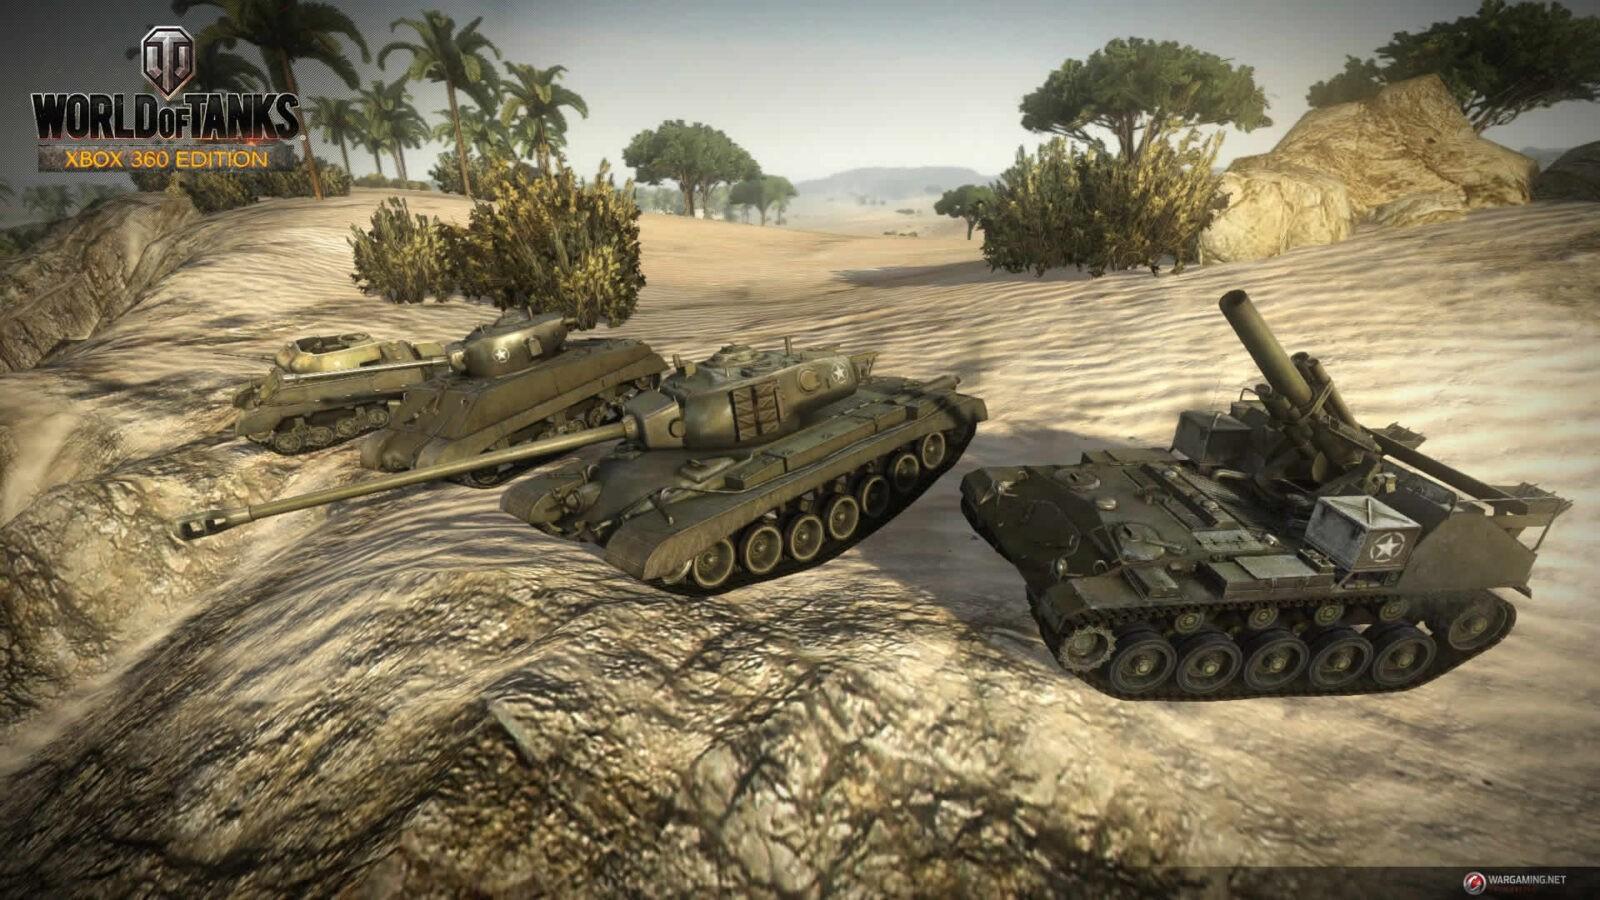 World of Tanks: Xbox 360 Edition (XBOX360) 4